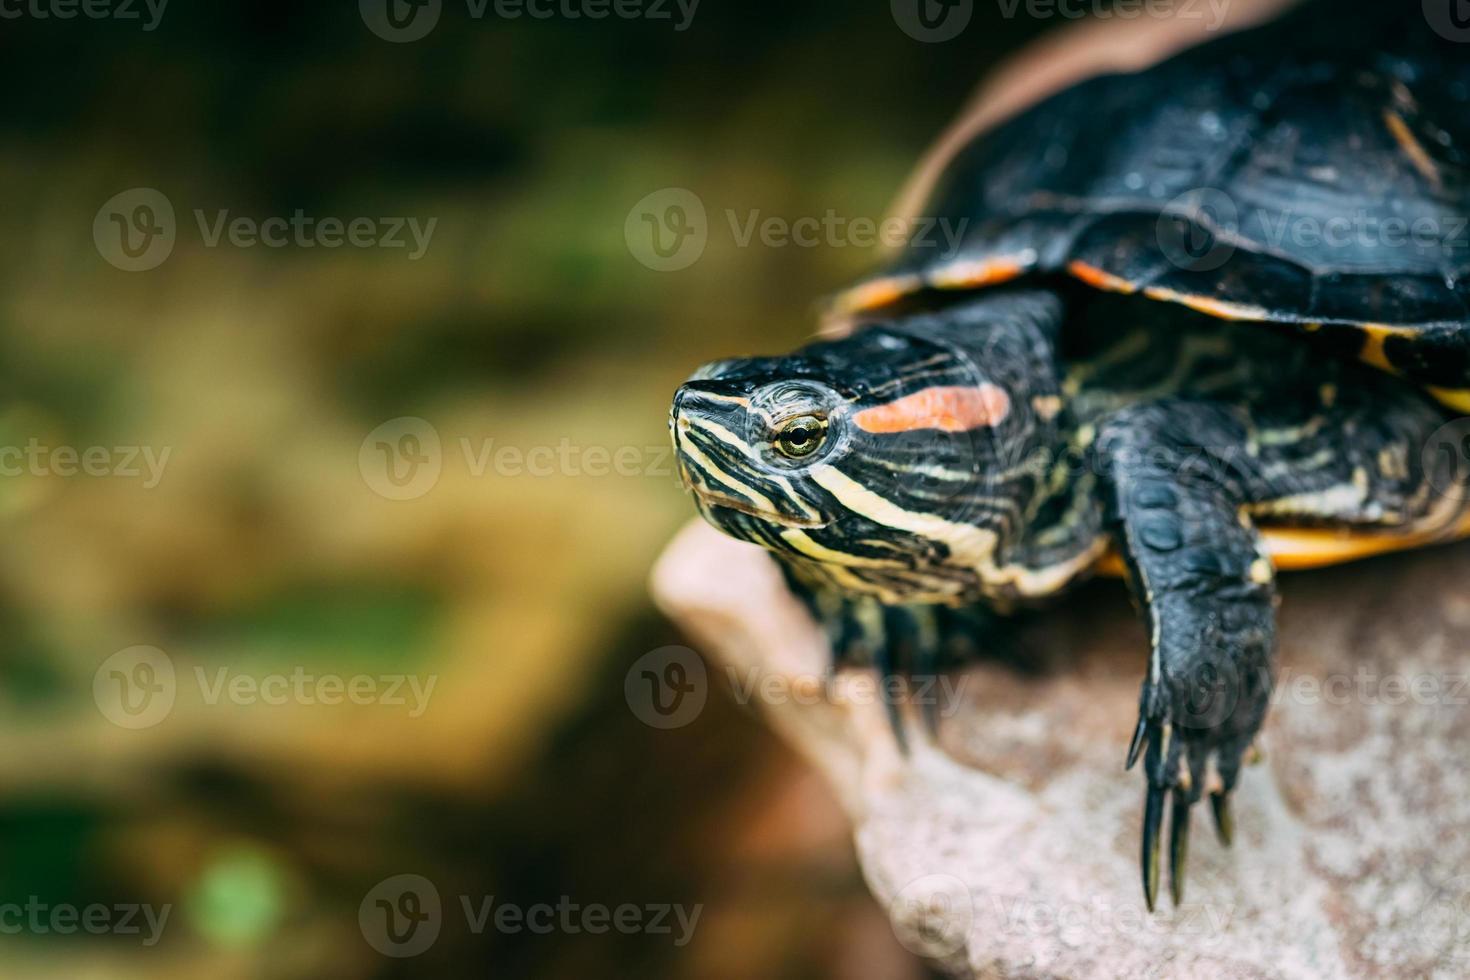 pequeña tortuga de oreja roja, tortuga acuática foto